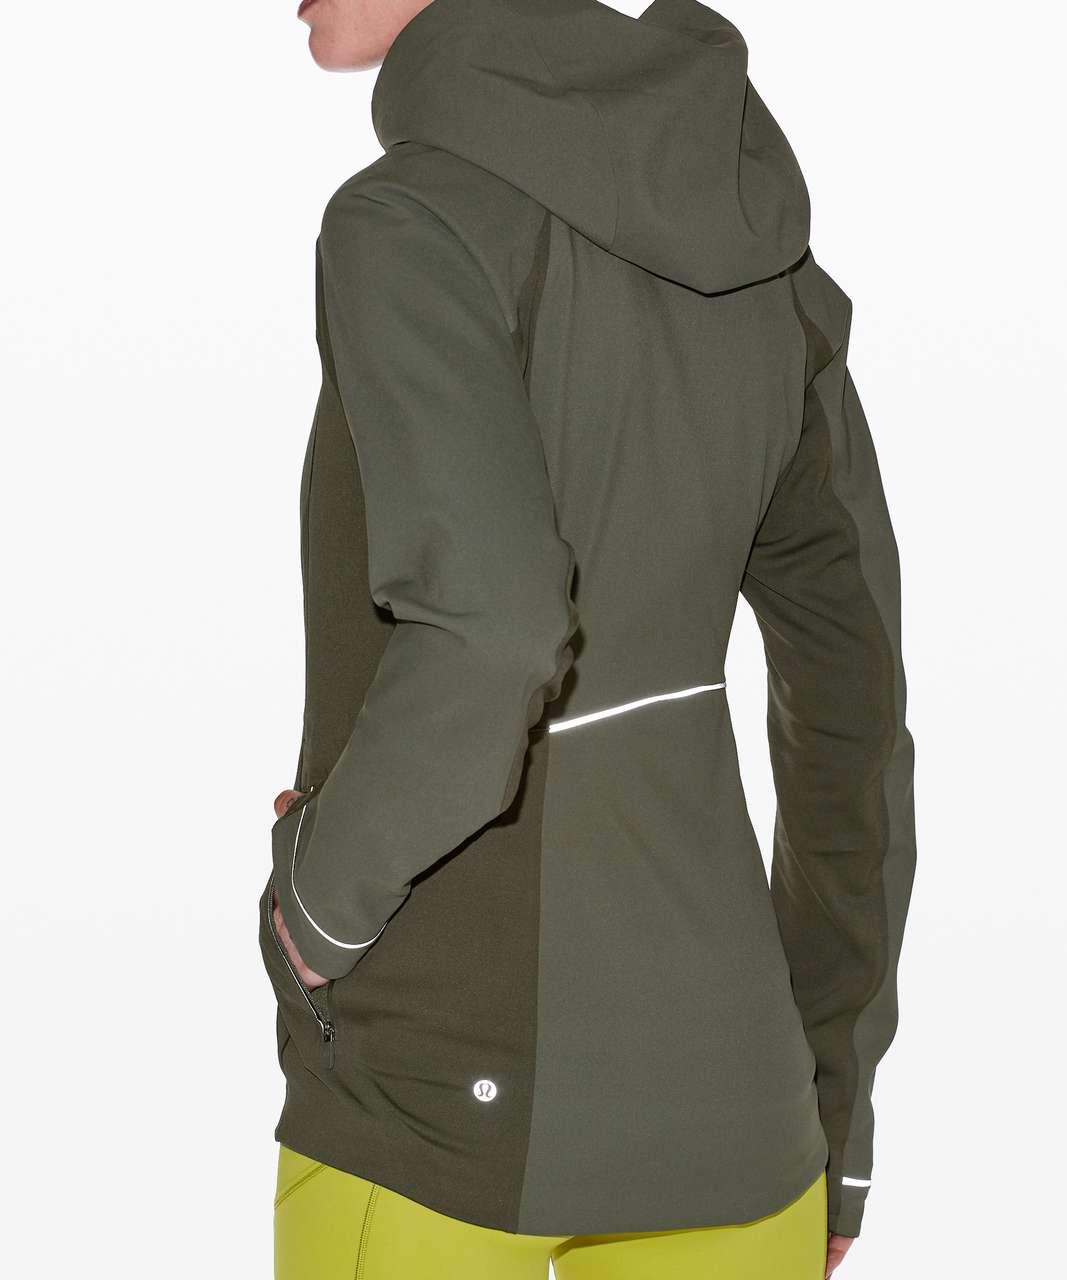 Lululemon Cross Chill Jacket - Dark Olive